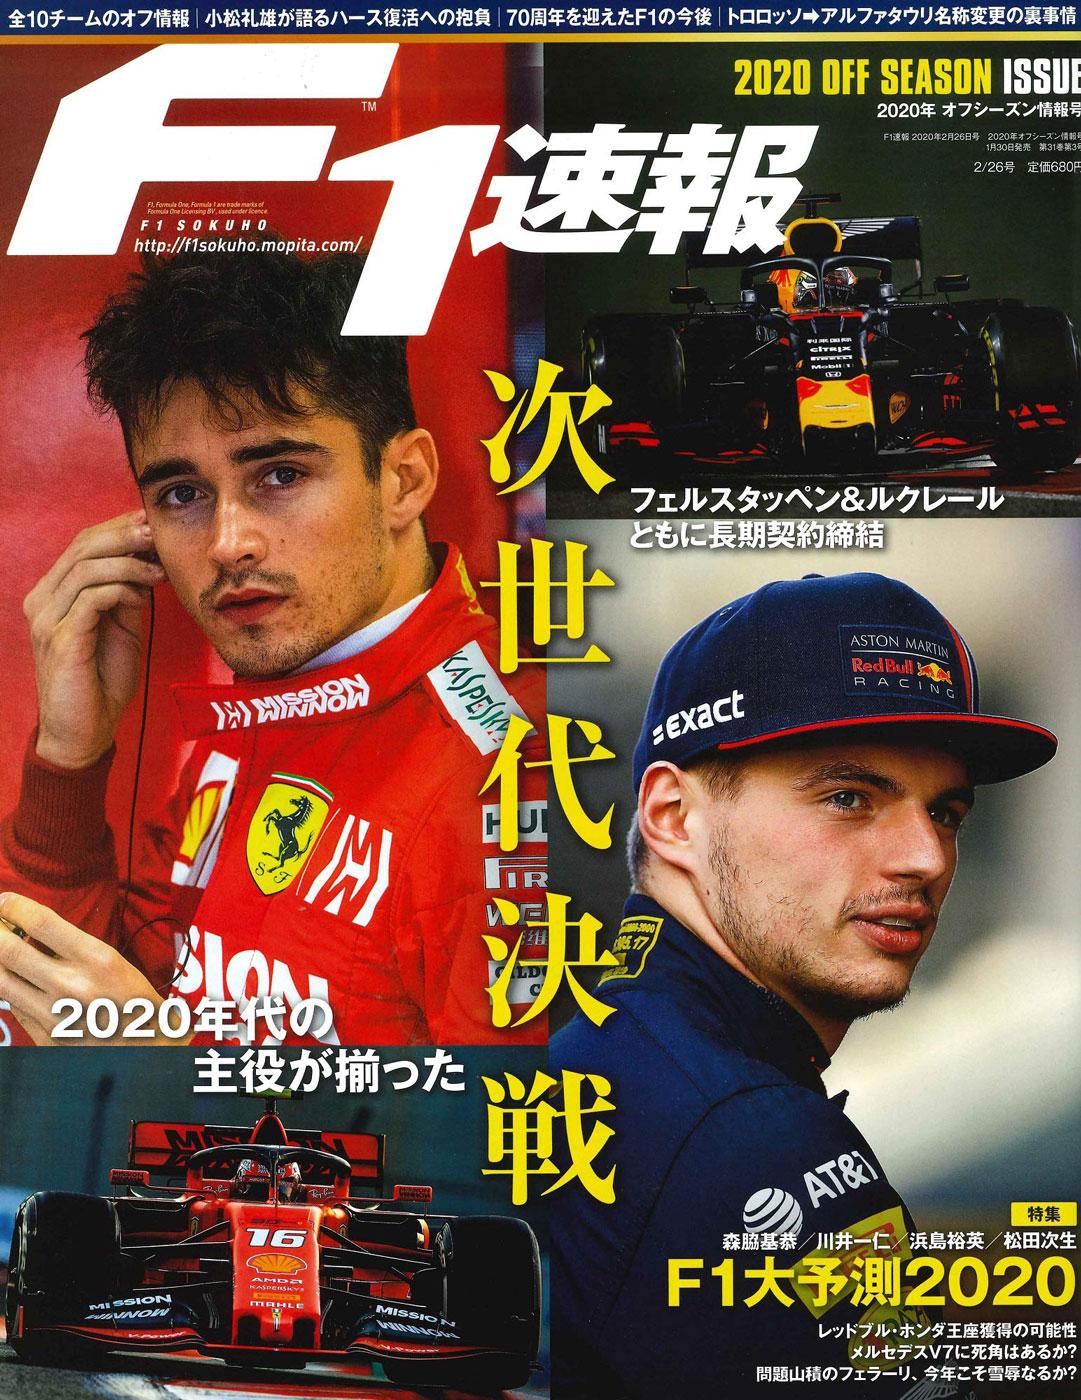 F1速報 2020年オフシーズン情報号 2020.1.30